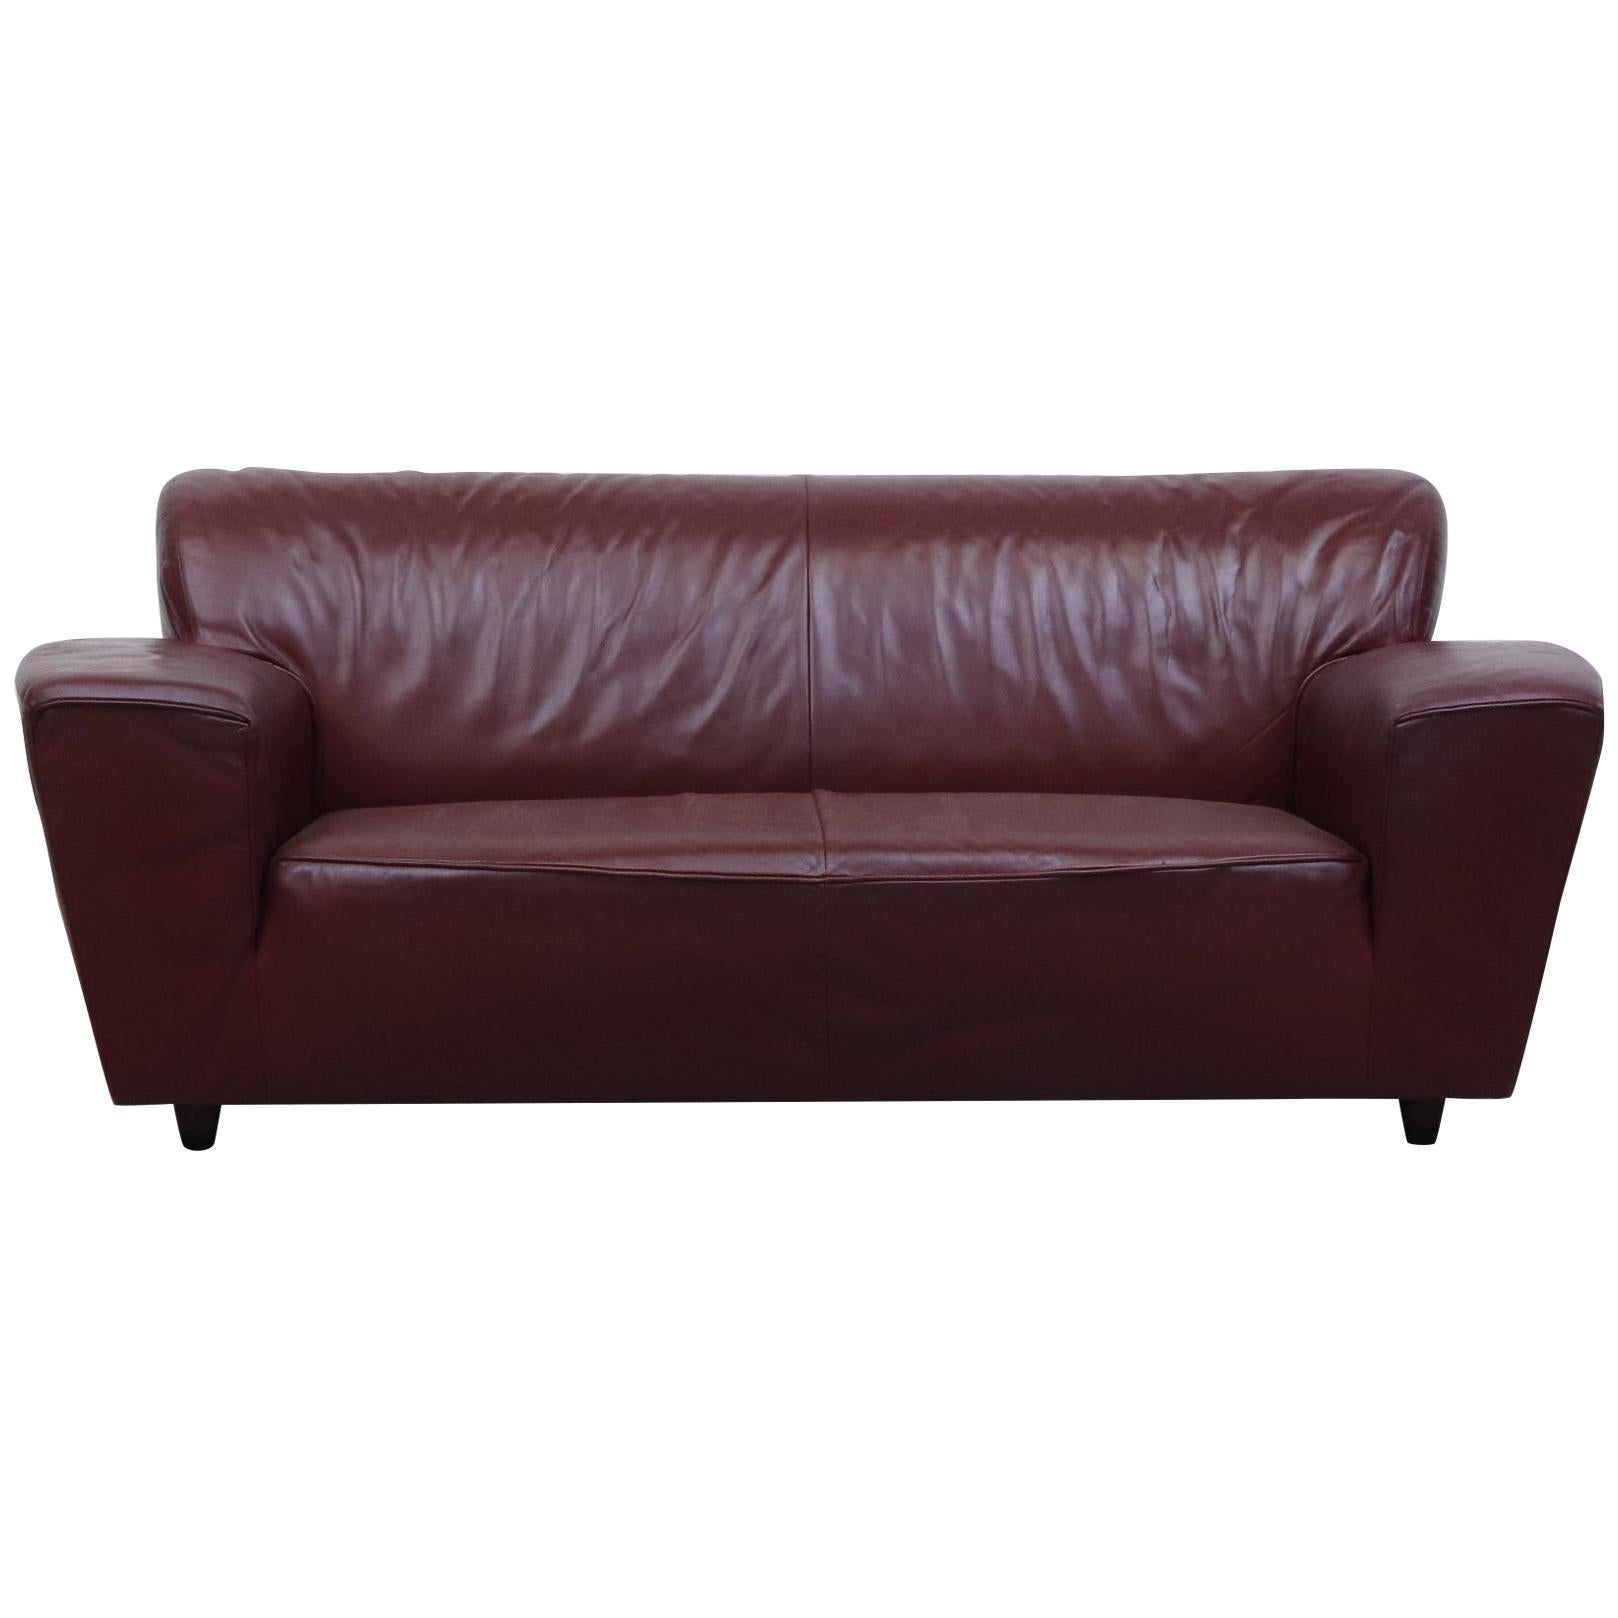 Gerard Van Den Berg 'Corvette' Sofa in Bordeaux Leather